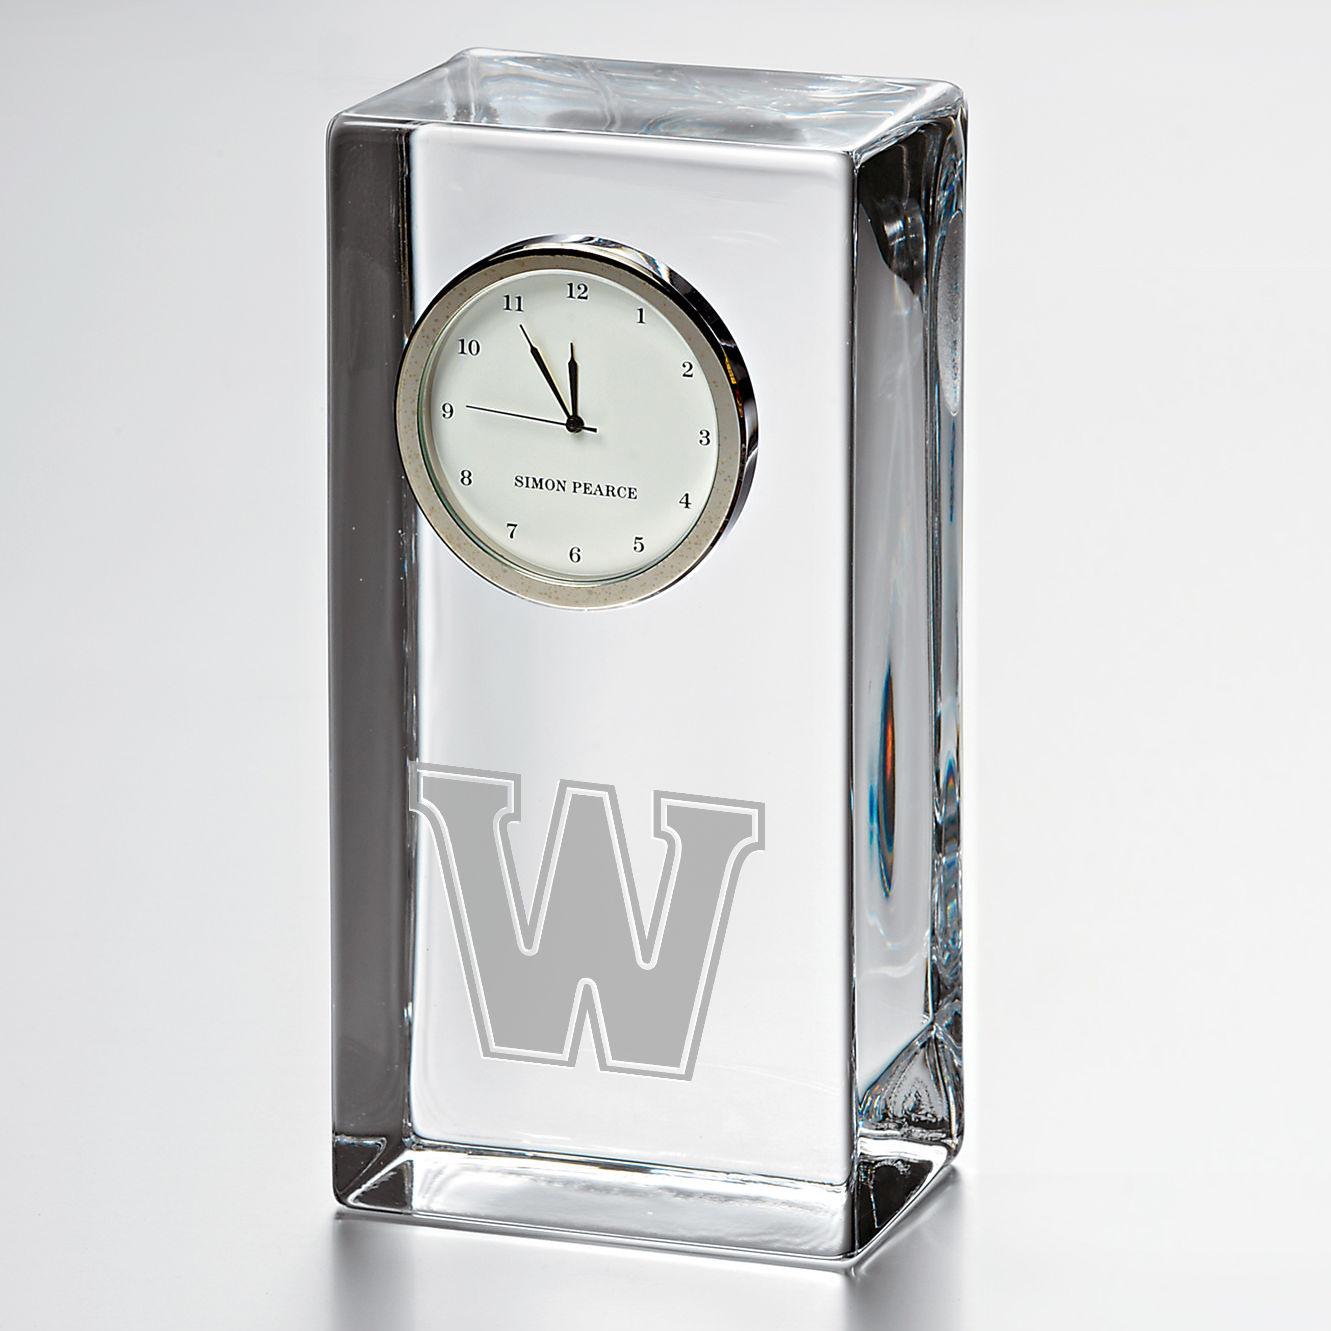 Williams Tall Class Desk Clock by Simon Pearce